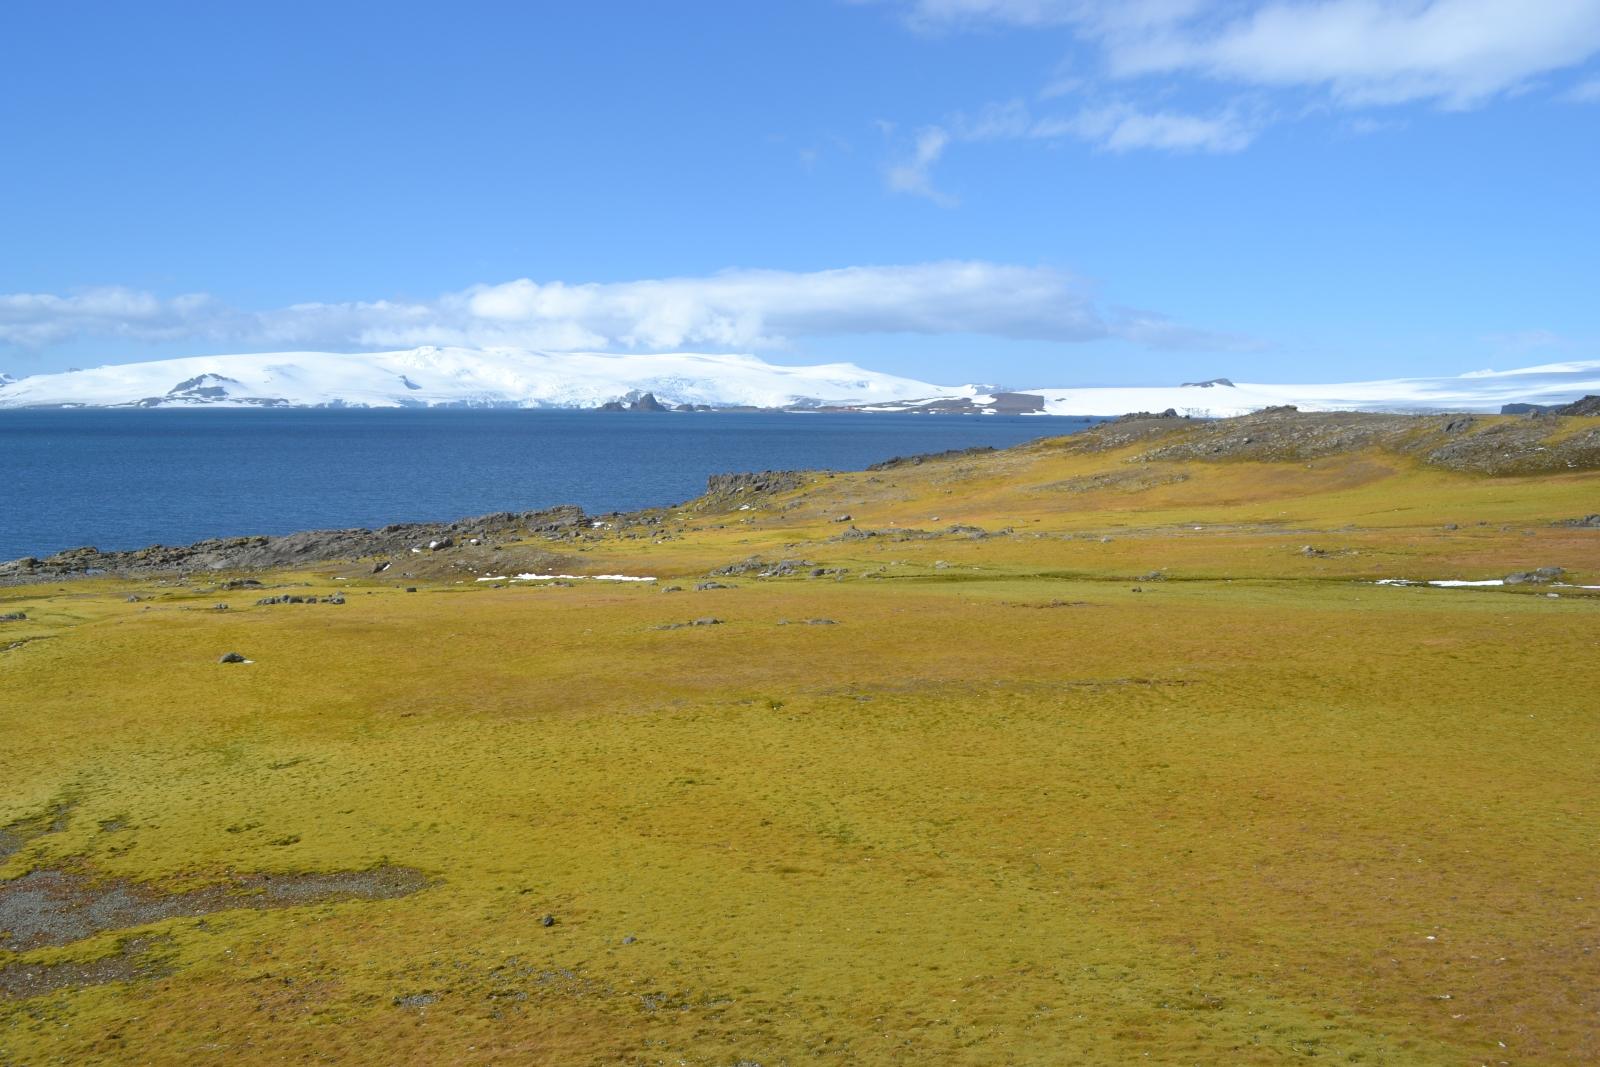 Antarctic moss